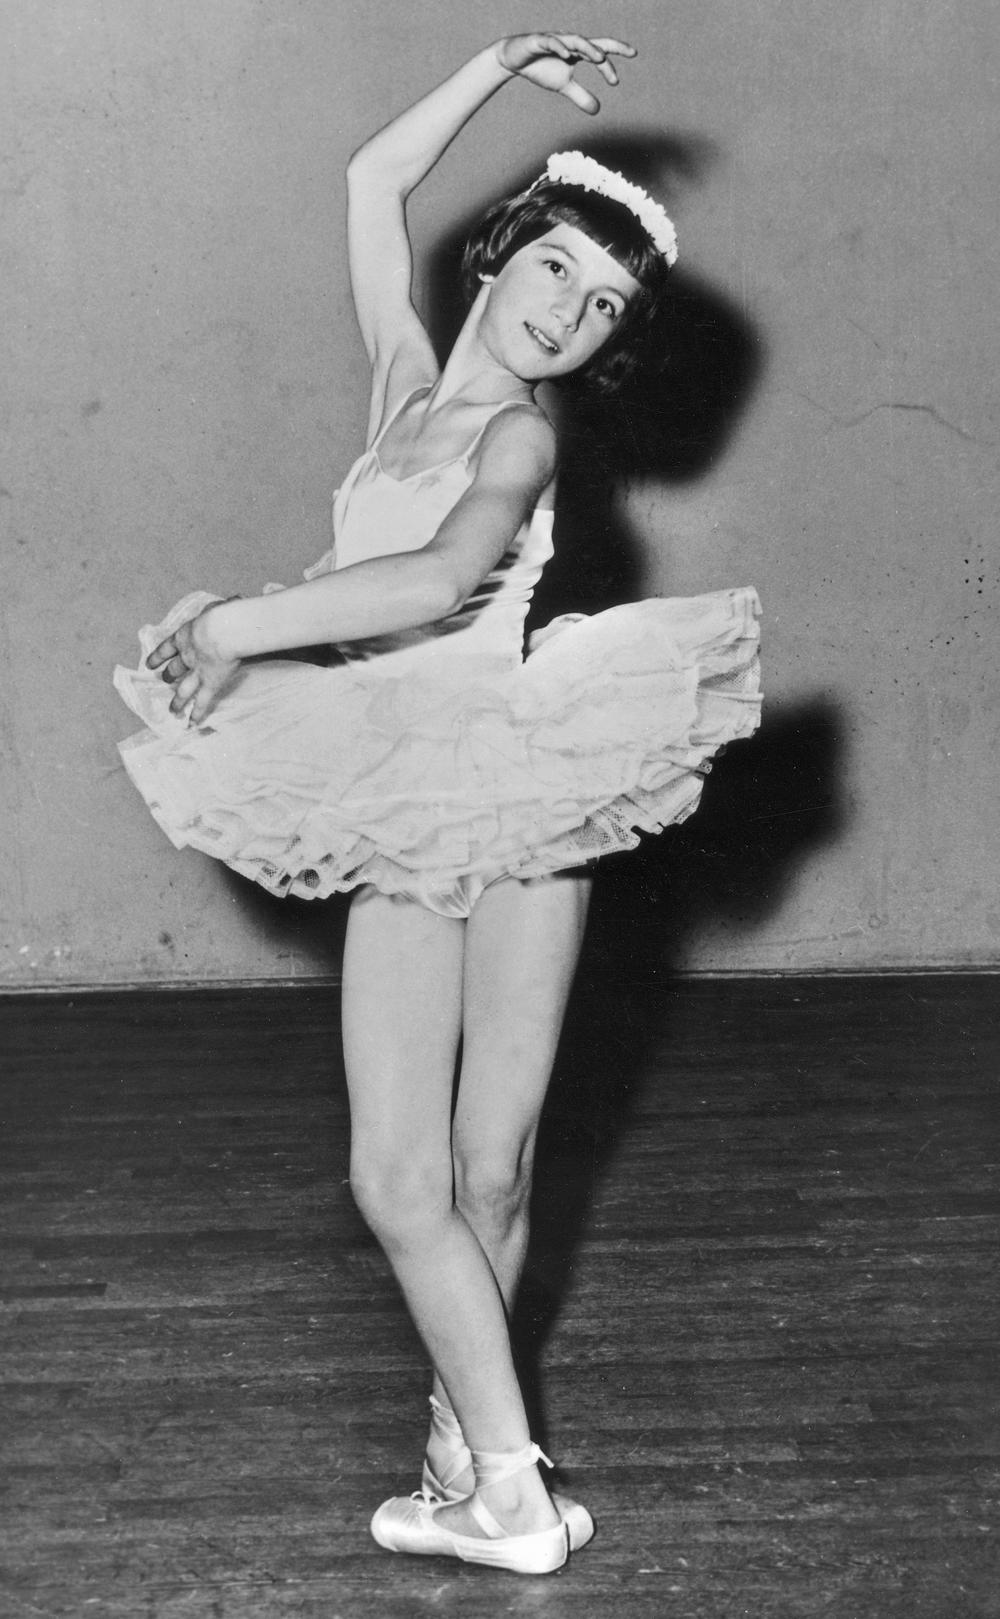 SHEILA, ARCHIVES environ 1954/1955